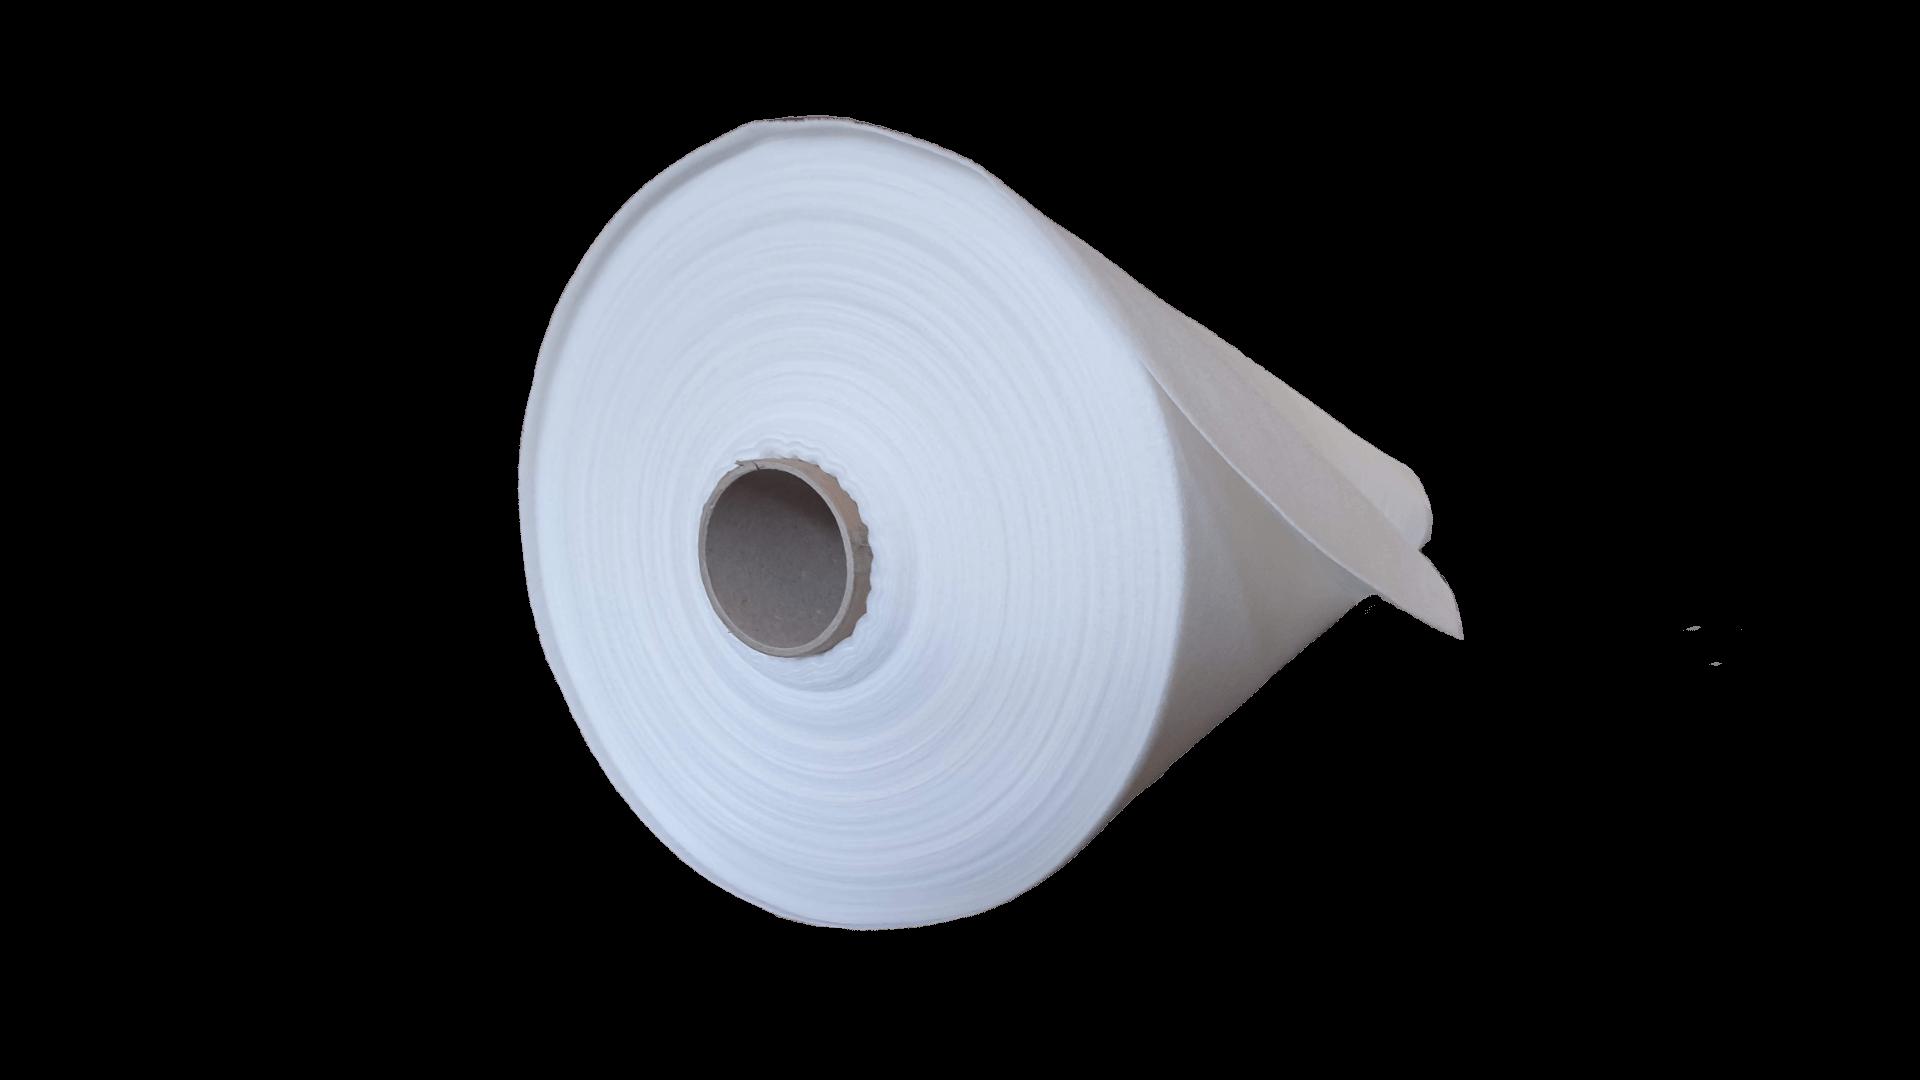 Geosin (P) 100 - material netesut polipropilena pentru articole medicale imagine 2021 somnart.ro